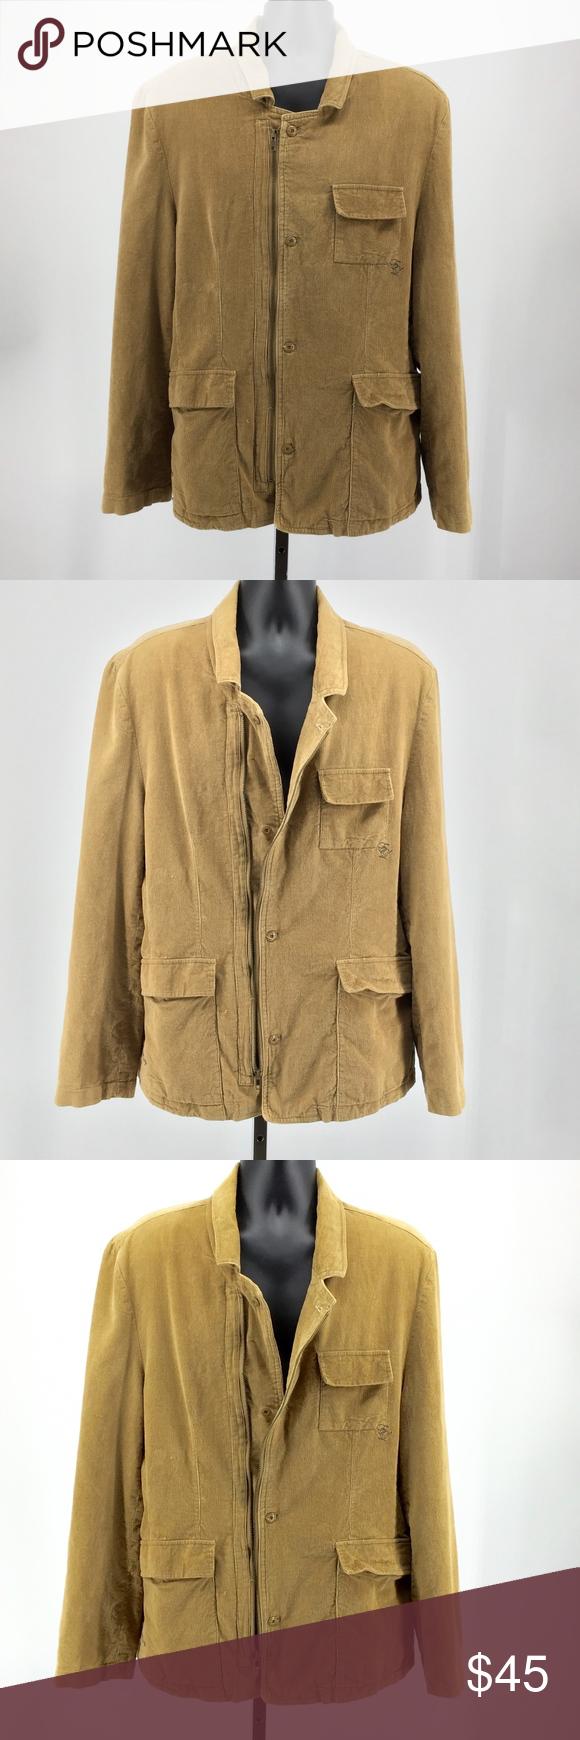 English Laundry Mens Corduroy Sport Jacket Jackets Sports Jacket Laundry Jackets [ 1740 x 580 Pixel ]